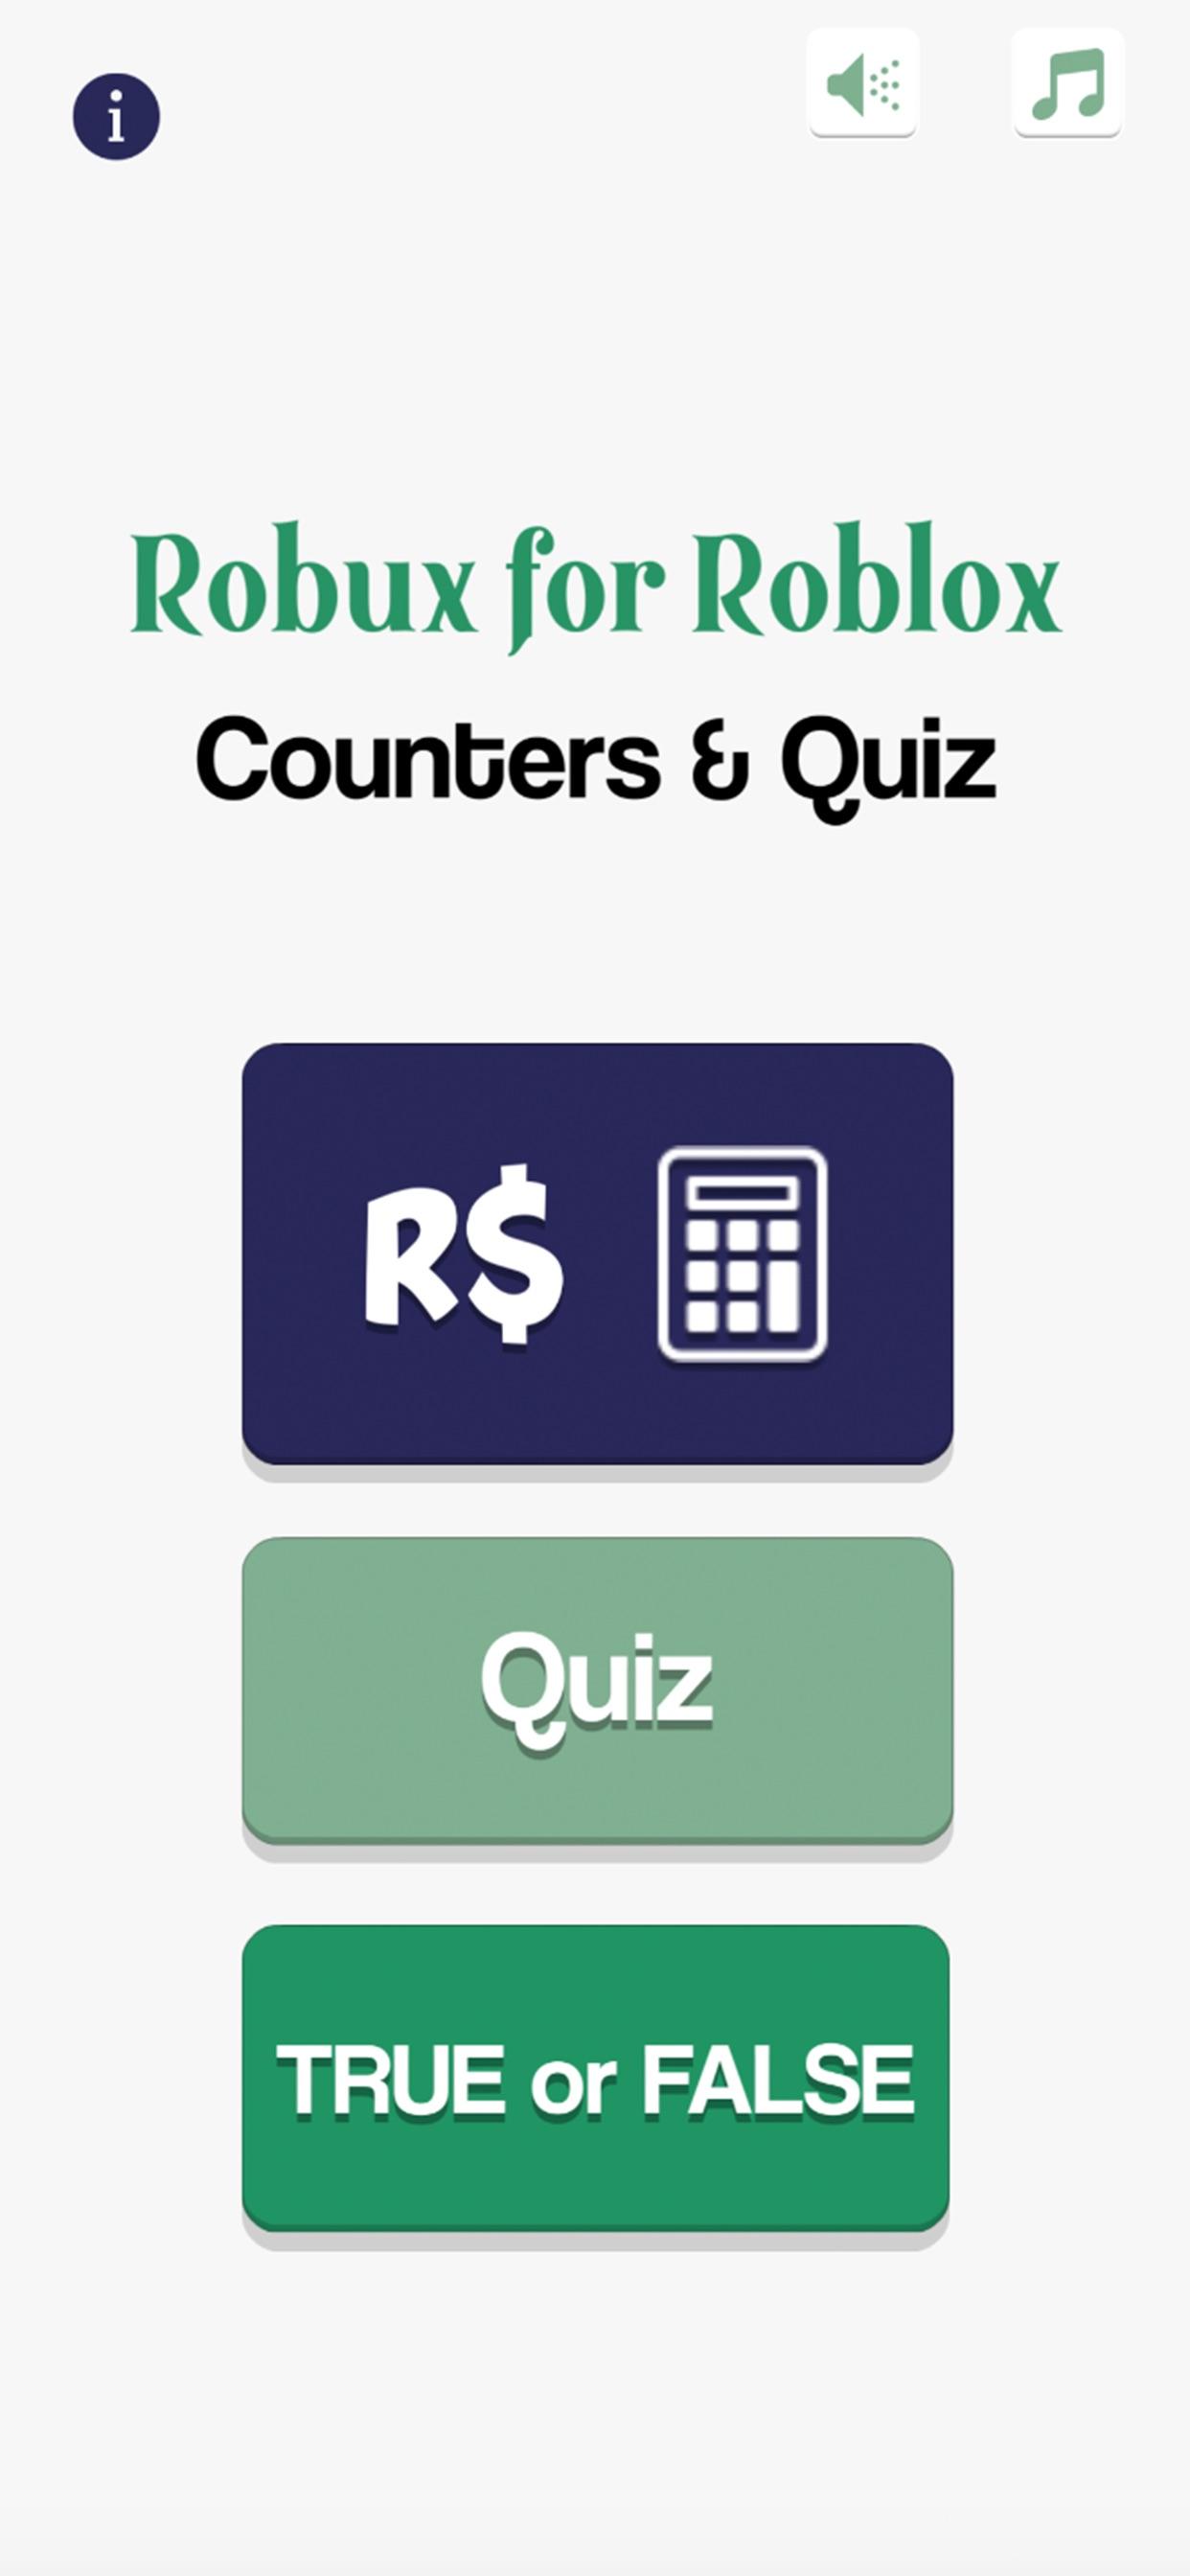 Robux Counter Roblox Quiz App Store Review Aso Revenue